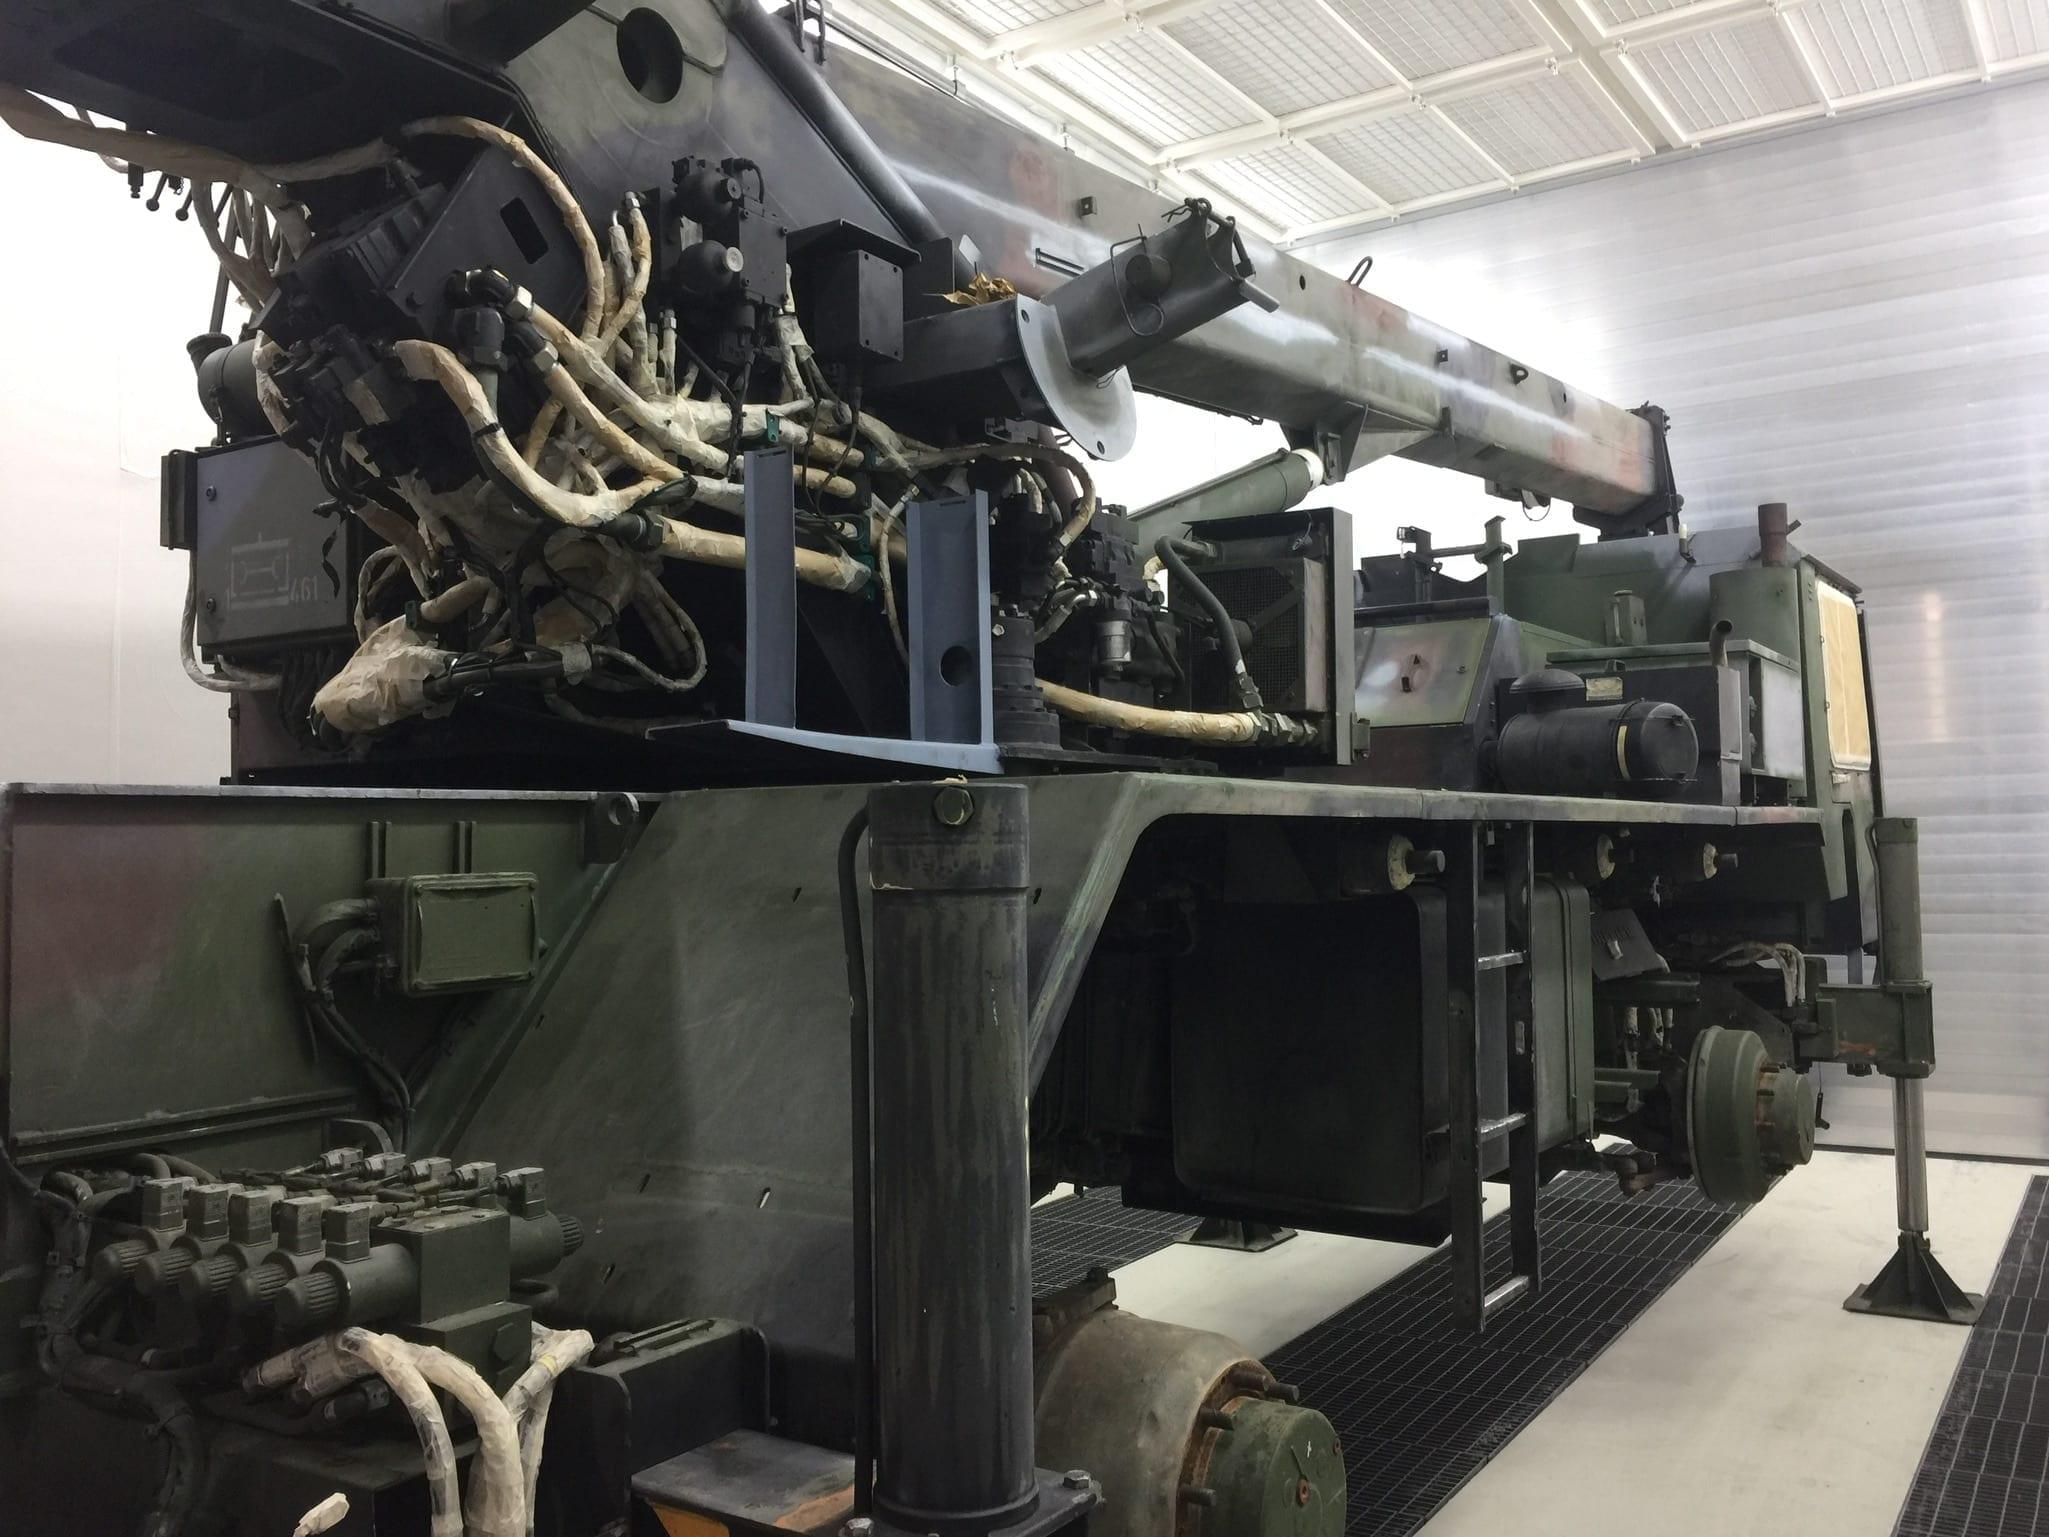 IMG 2543 - Bundeswehr Kranwagen